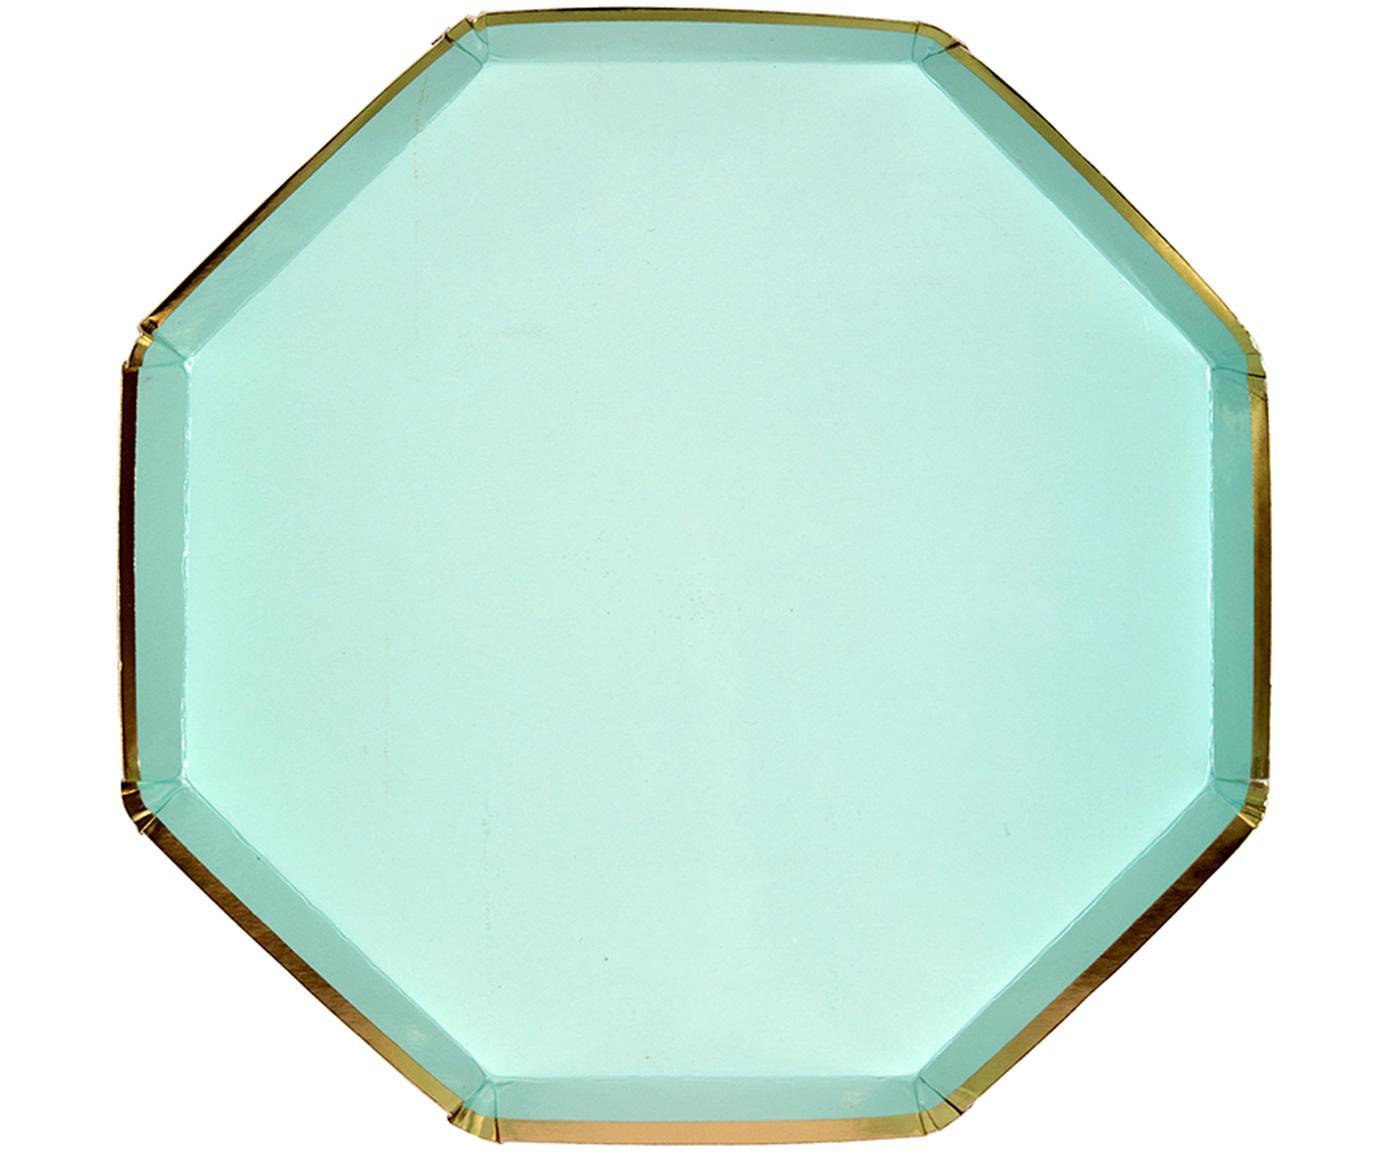 Platos de papel Simply Eco, 8uds., Papel, foliert, Verde menta, Ø 20 x Al 1 cm